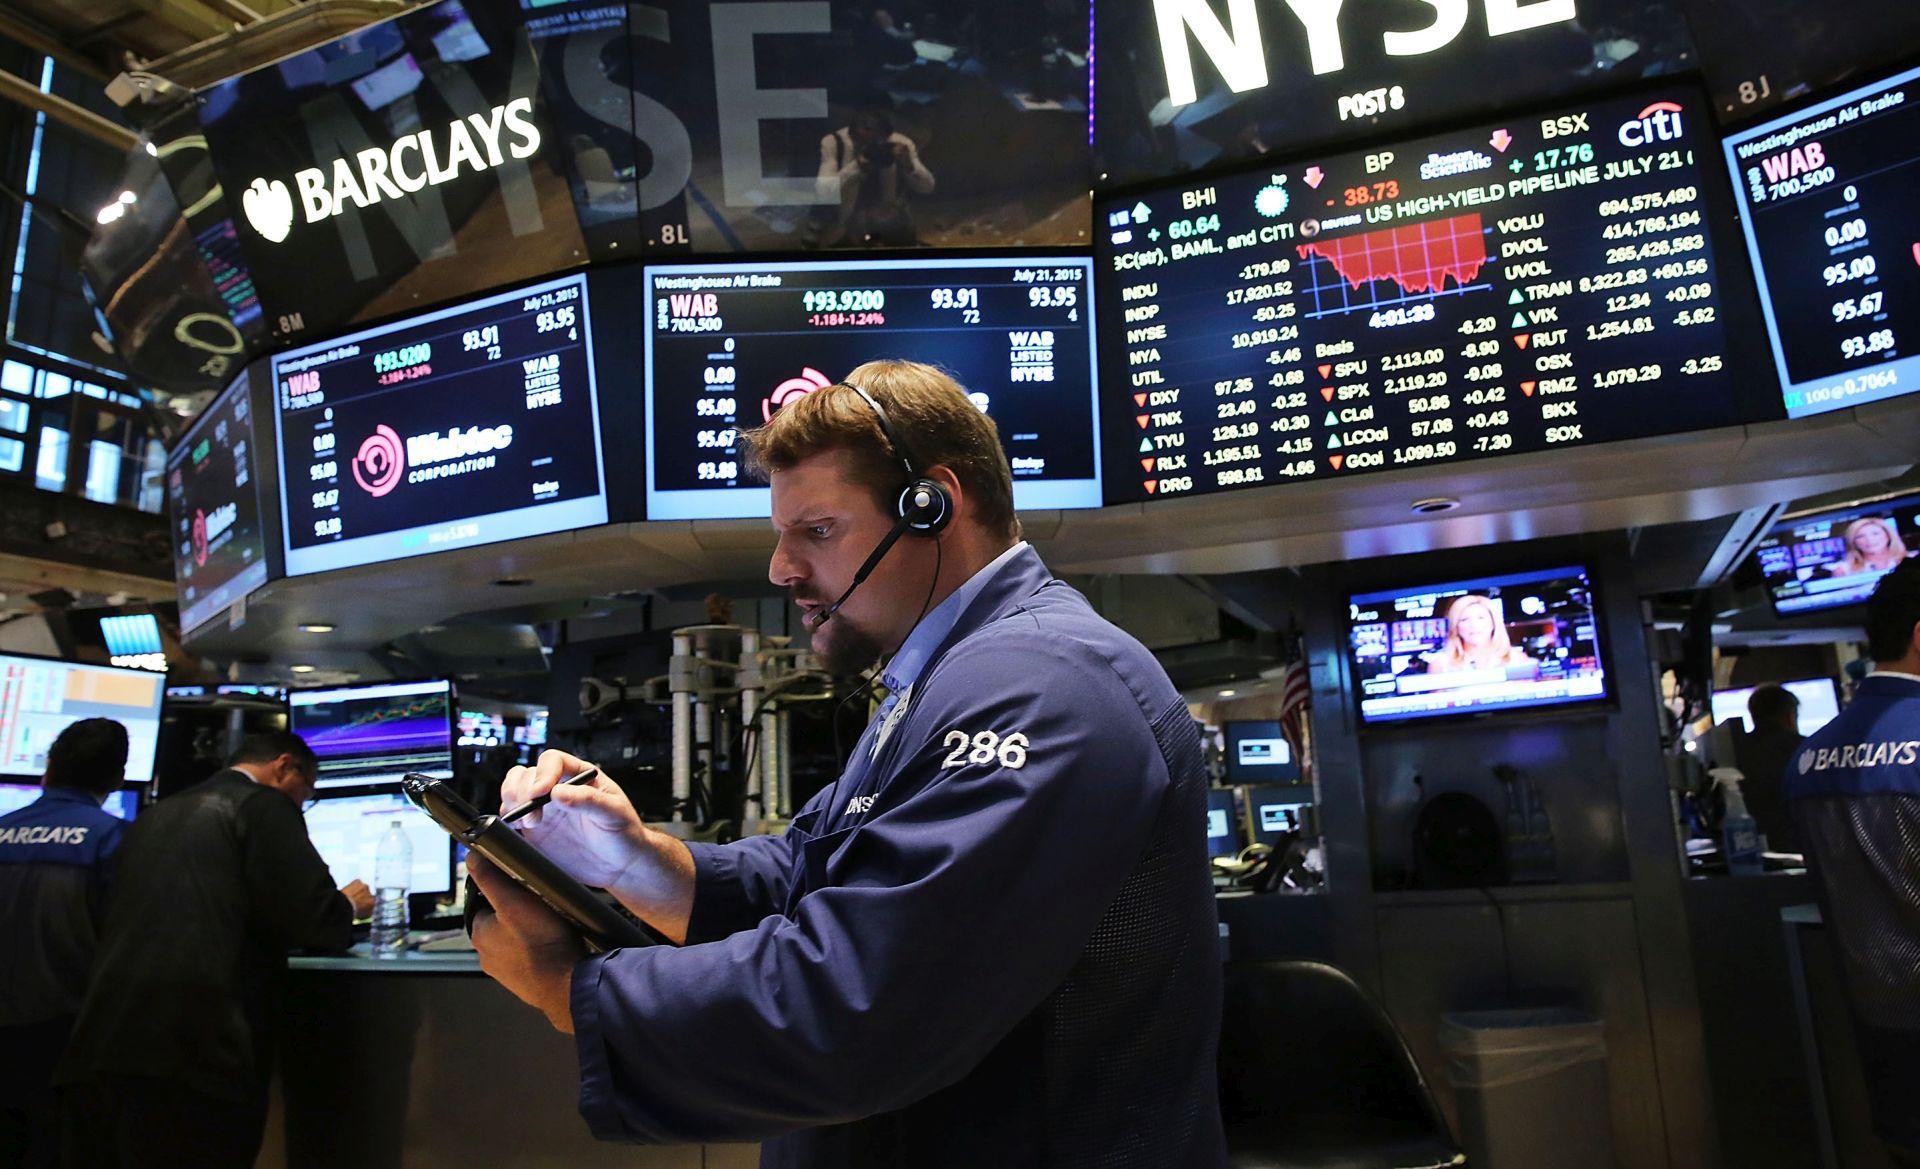 DIONICE NA BURZI Ferrari korak bliže Wall Streetu